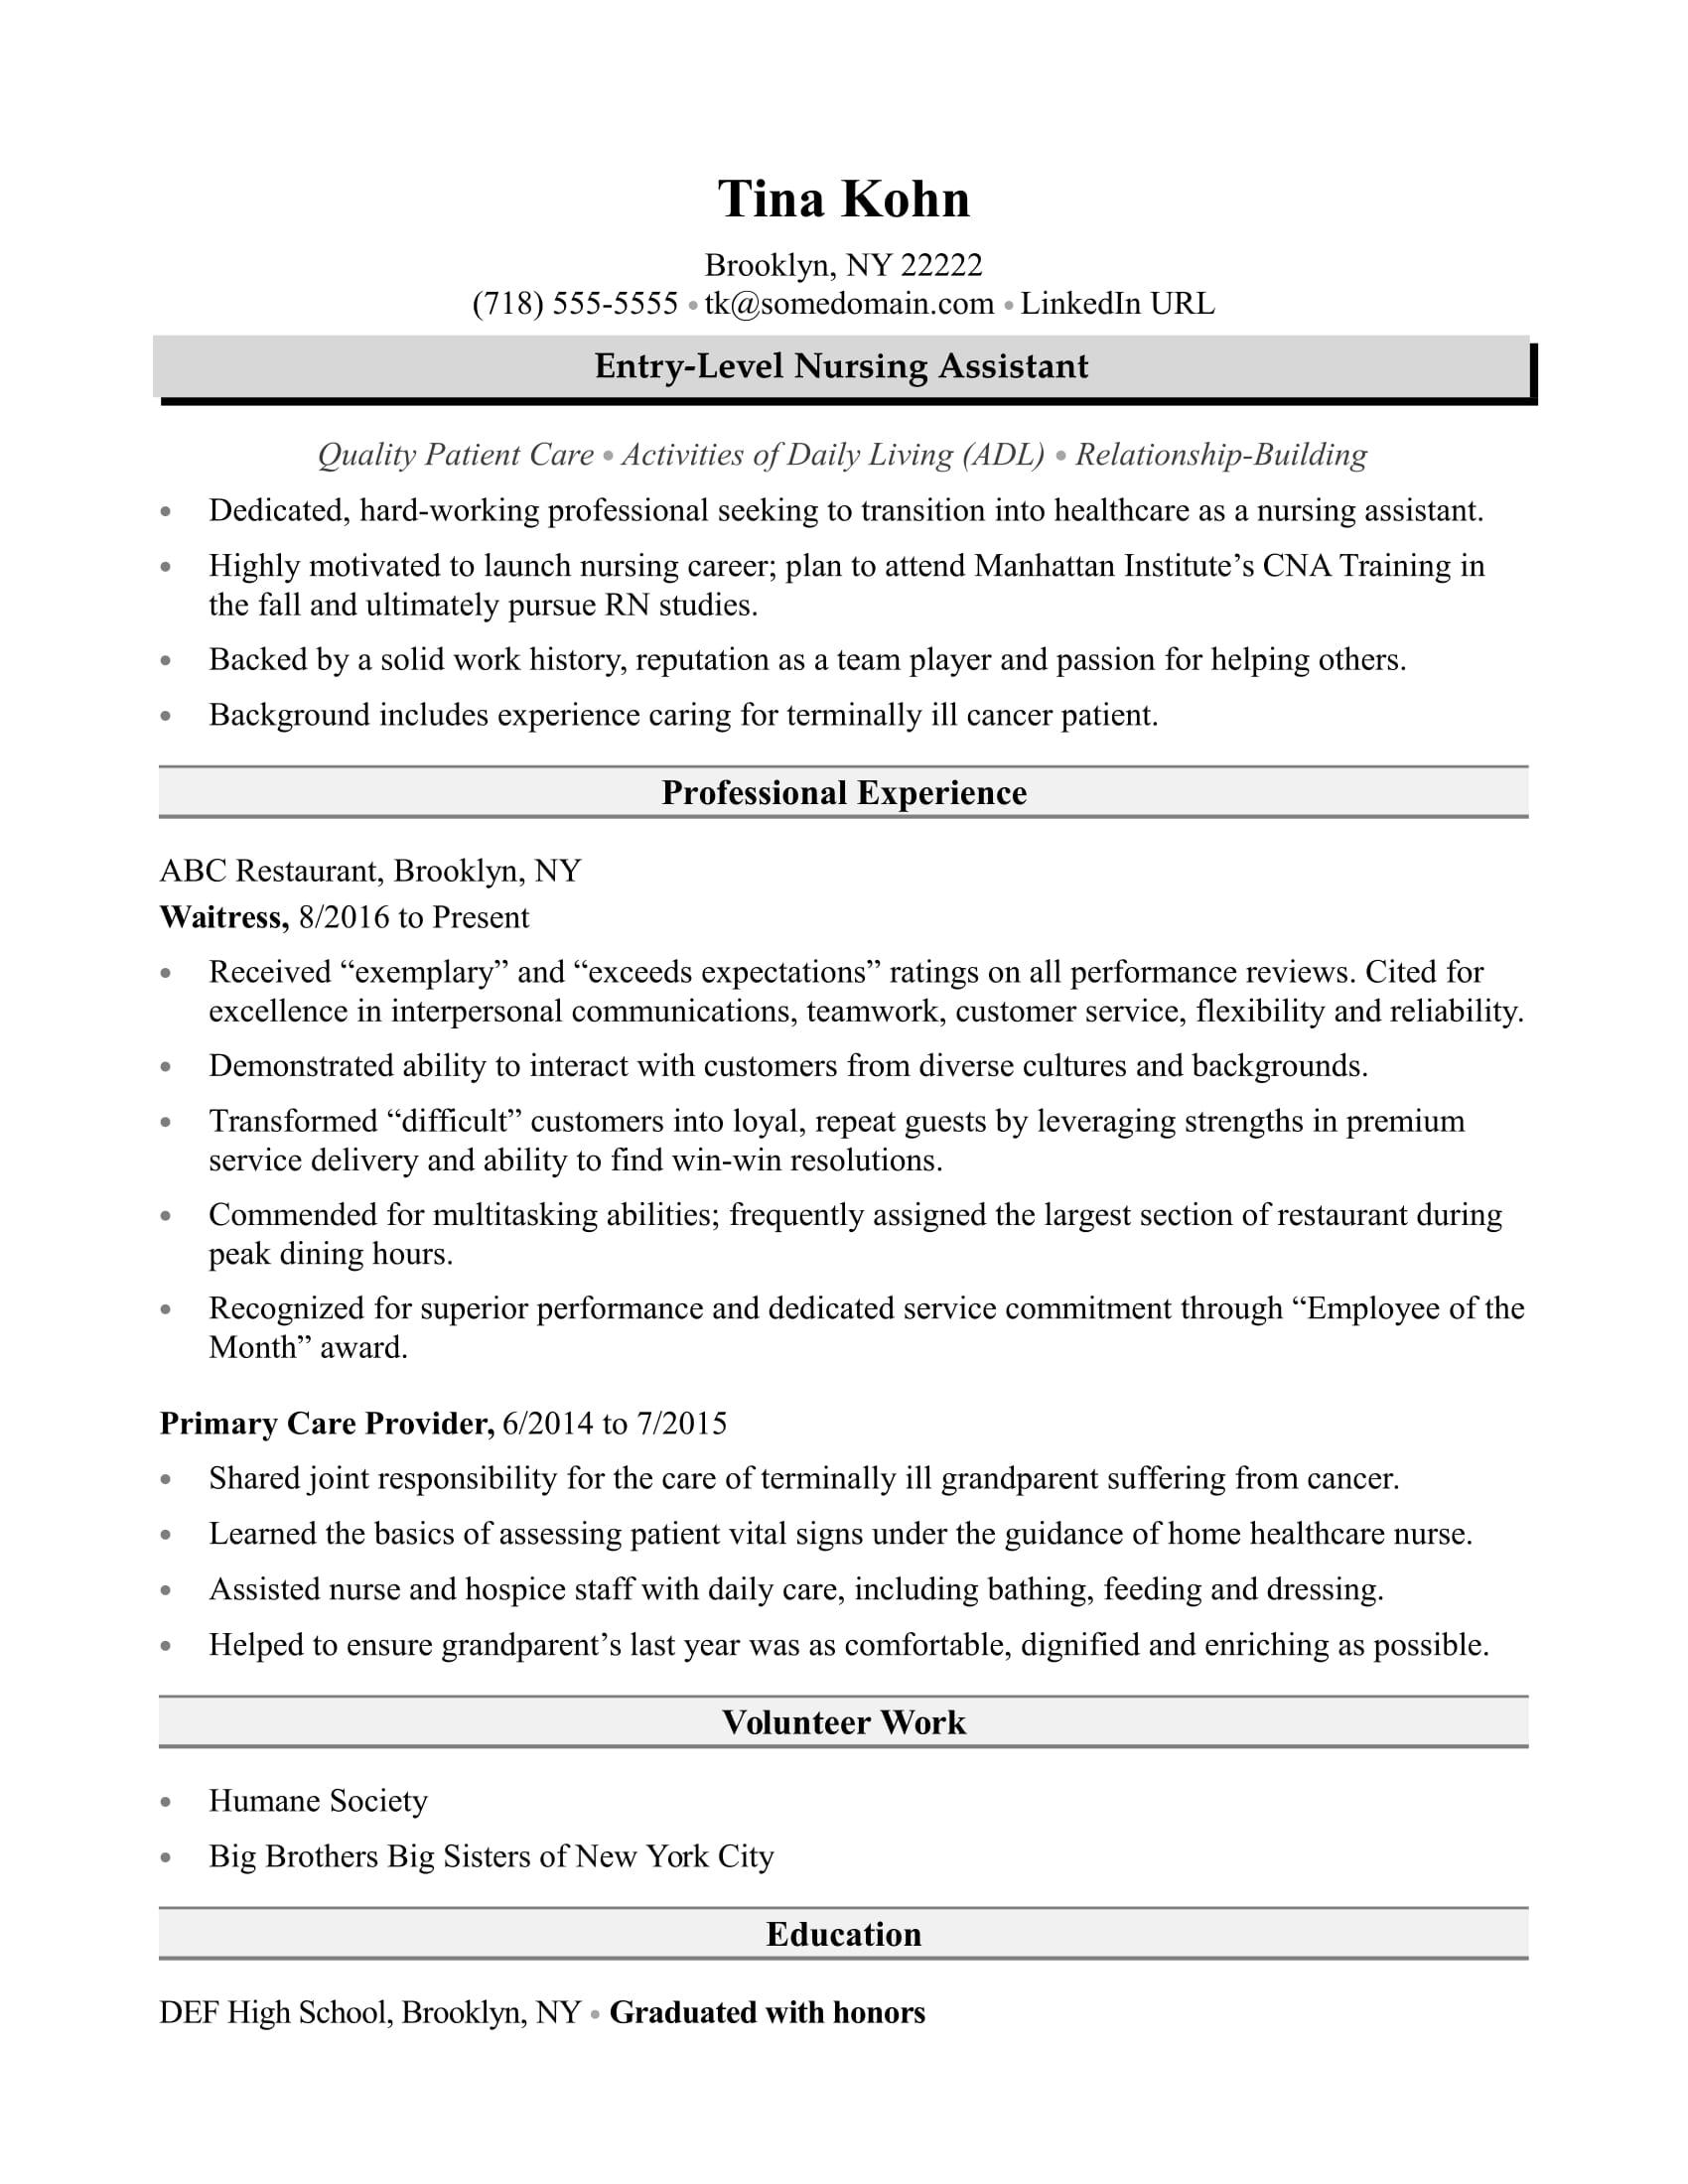 resume template nursing assistant